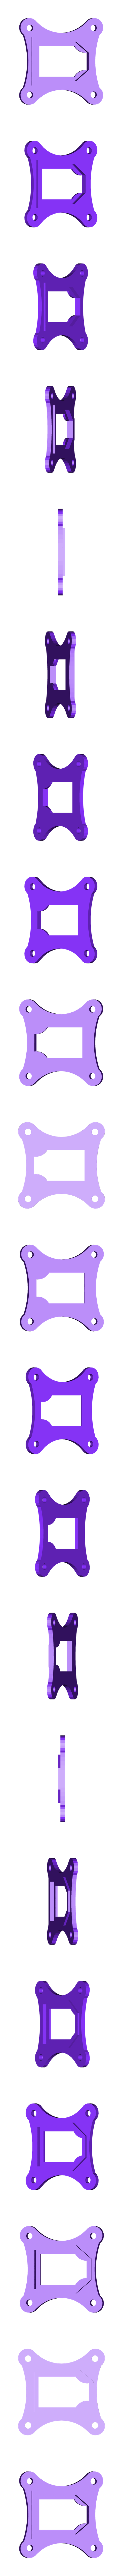 CADRE 30.5X30.5  FURIOUS MINI RX FRSKY PART01 .stl Download free STL file Furious Mini RX FRSKY Adapter Receiver + Buzzer 9mm • 3D printing object, Microdure